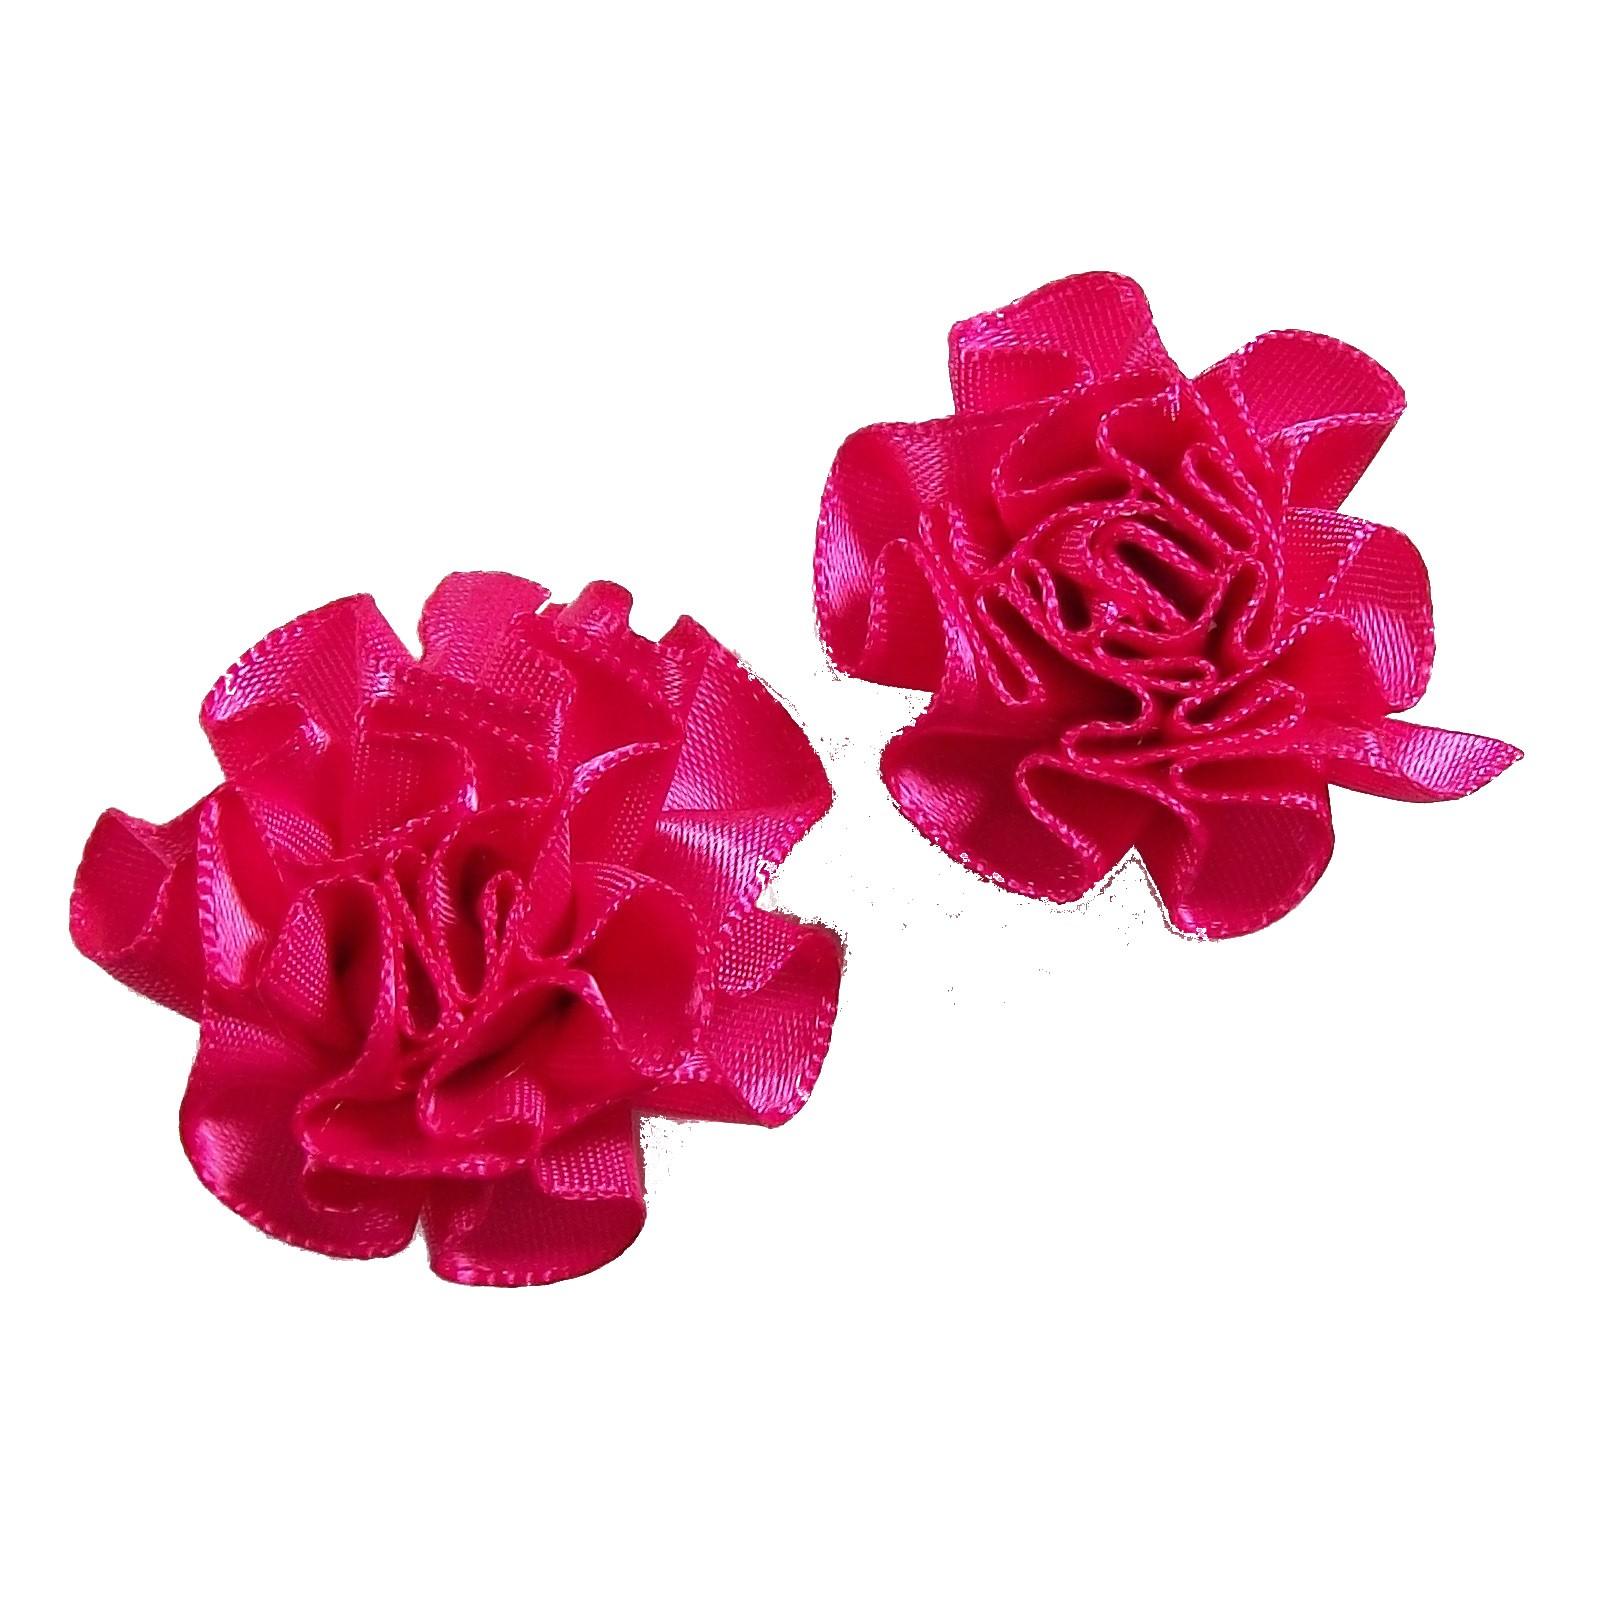 Satin Ribbon Rosettes Flowers Roses 3cm Wide